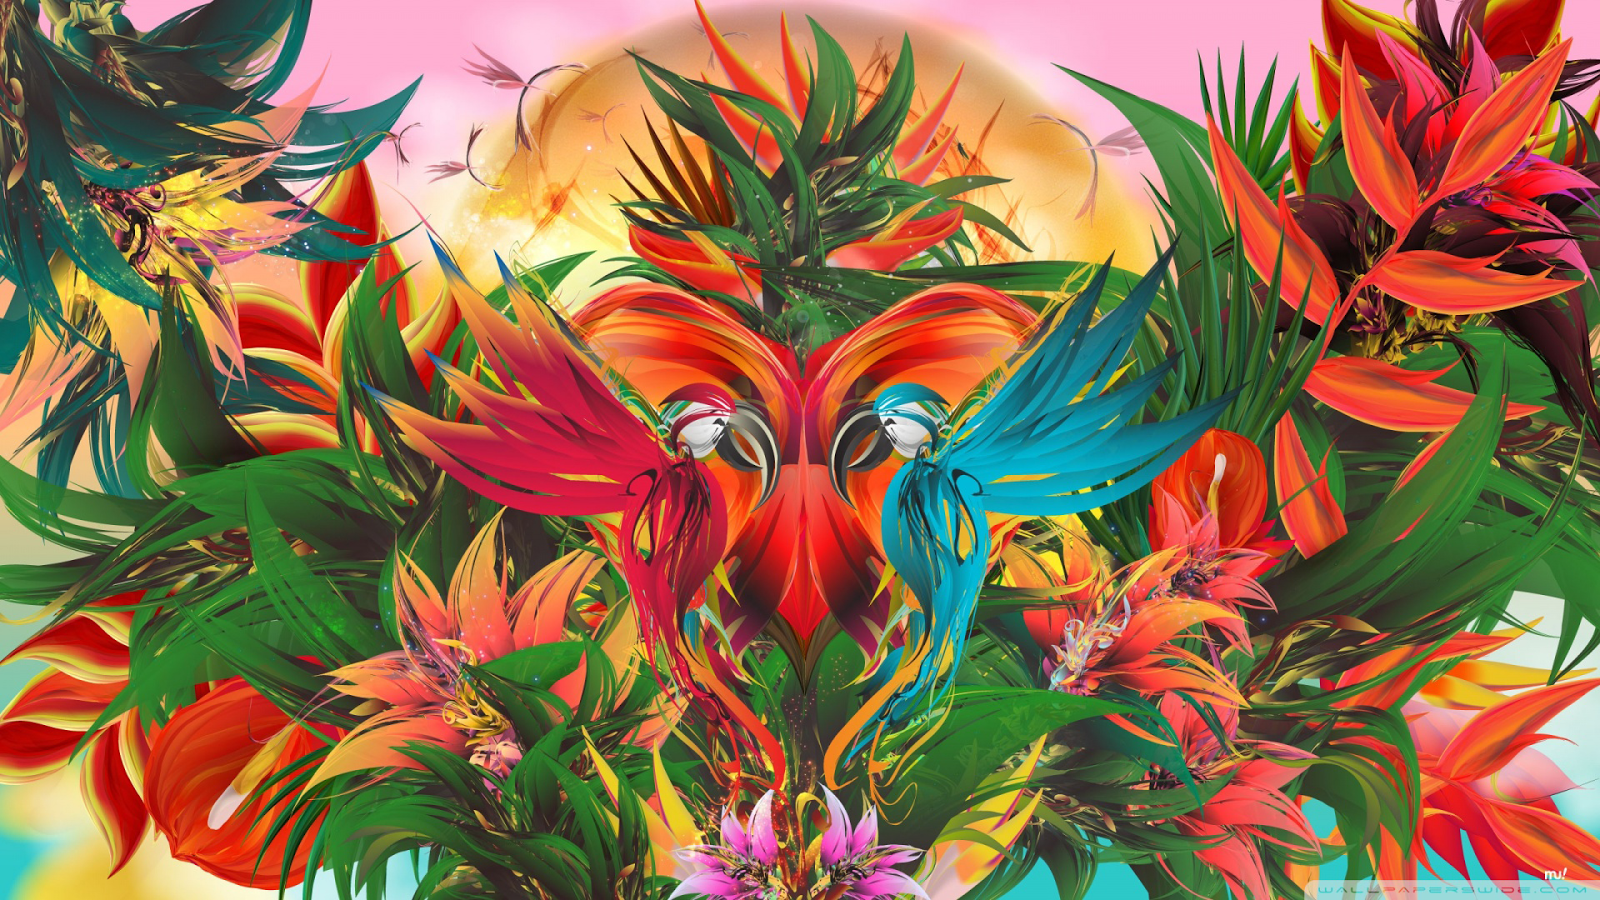 Abstract Tropical Jungle Paradise Illustration Hd Wallpaper 1600x900